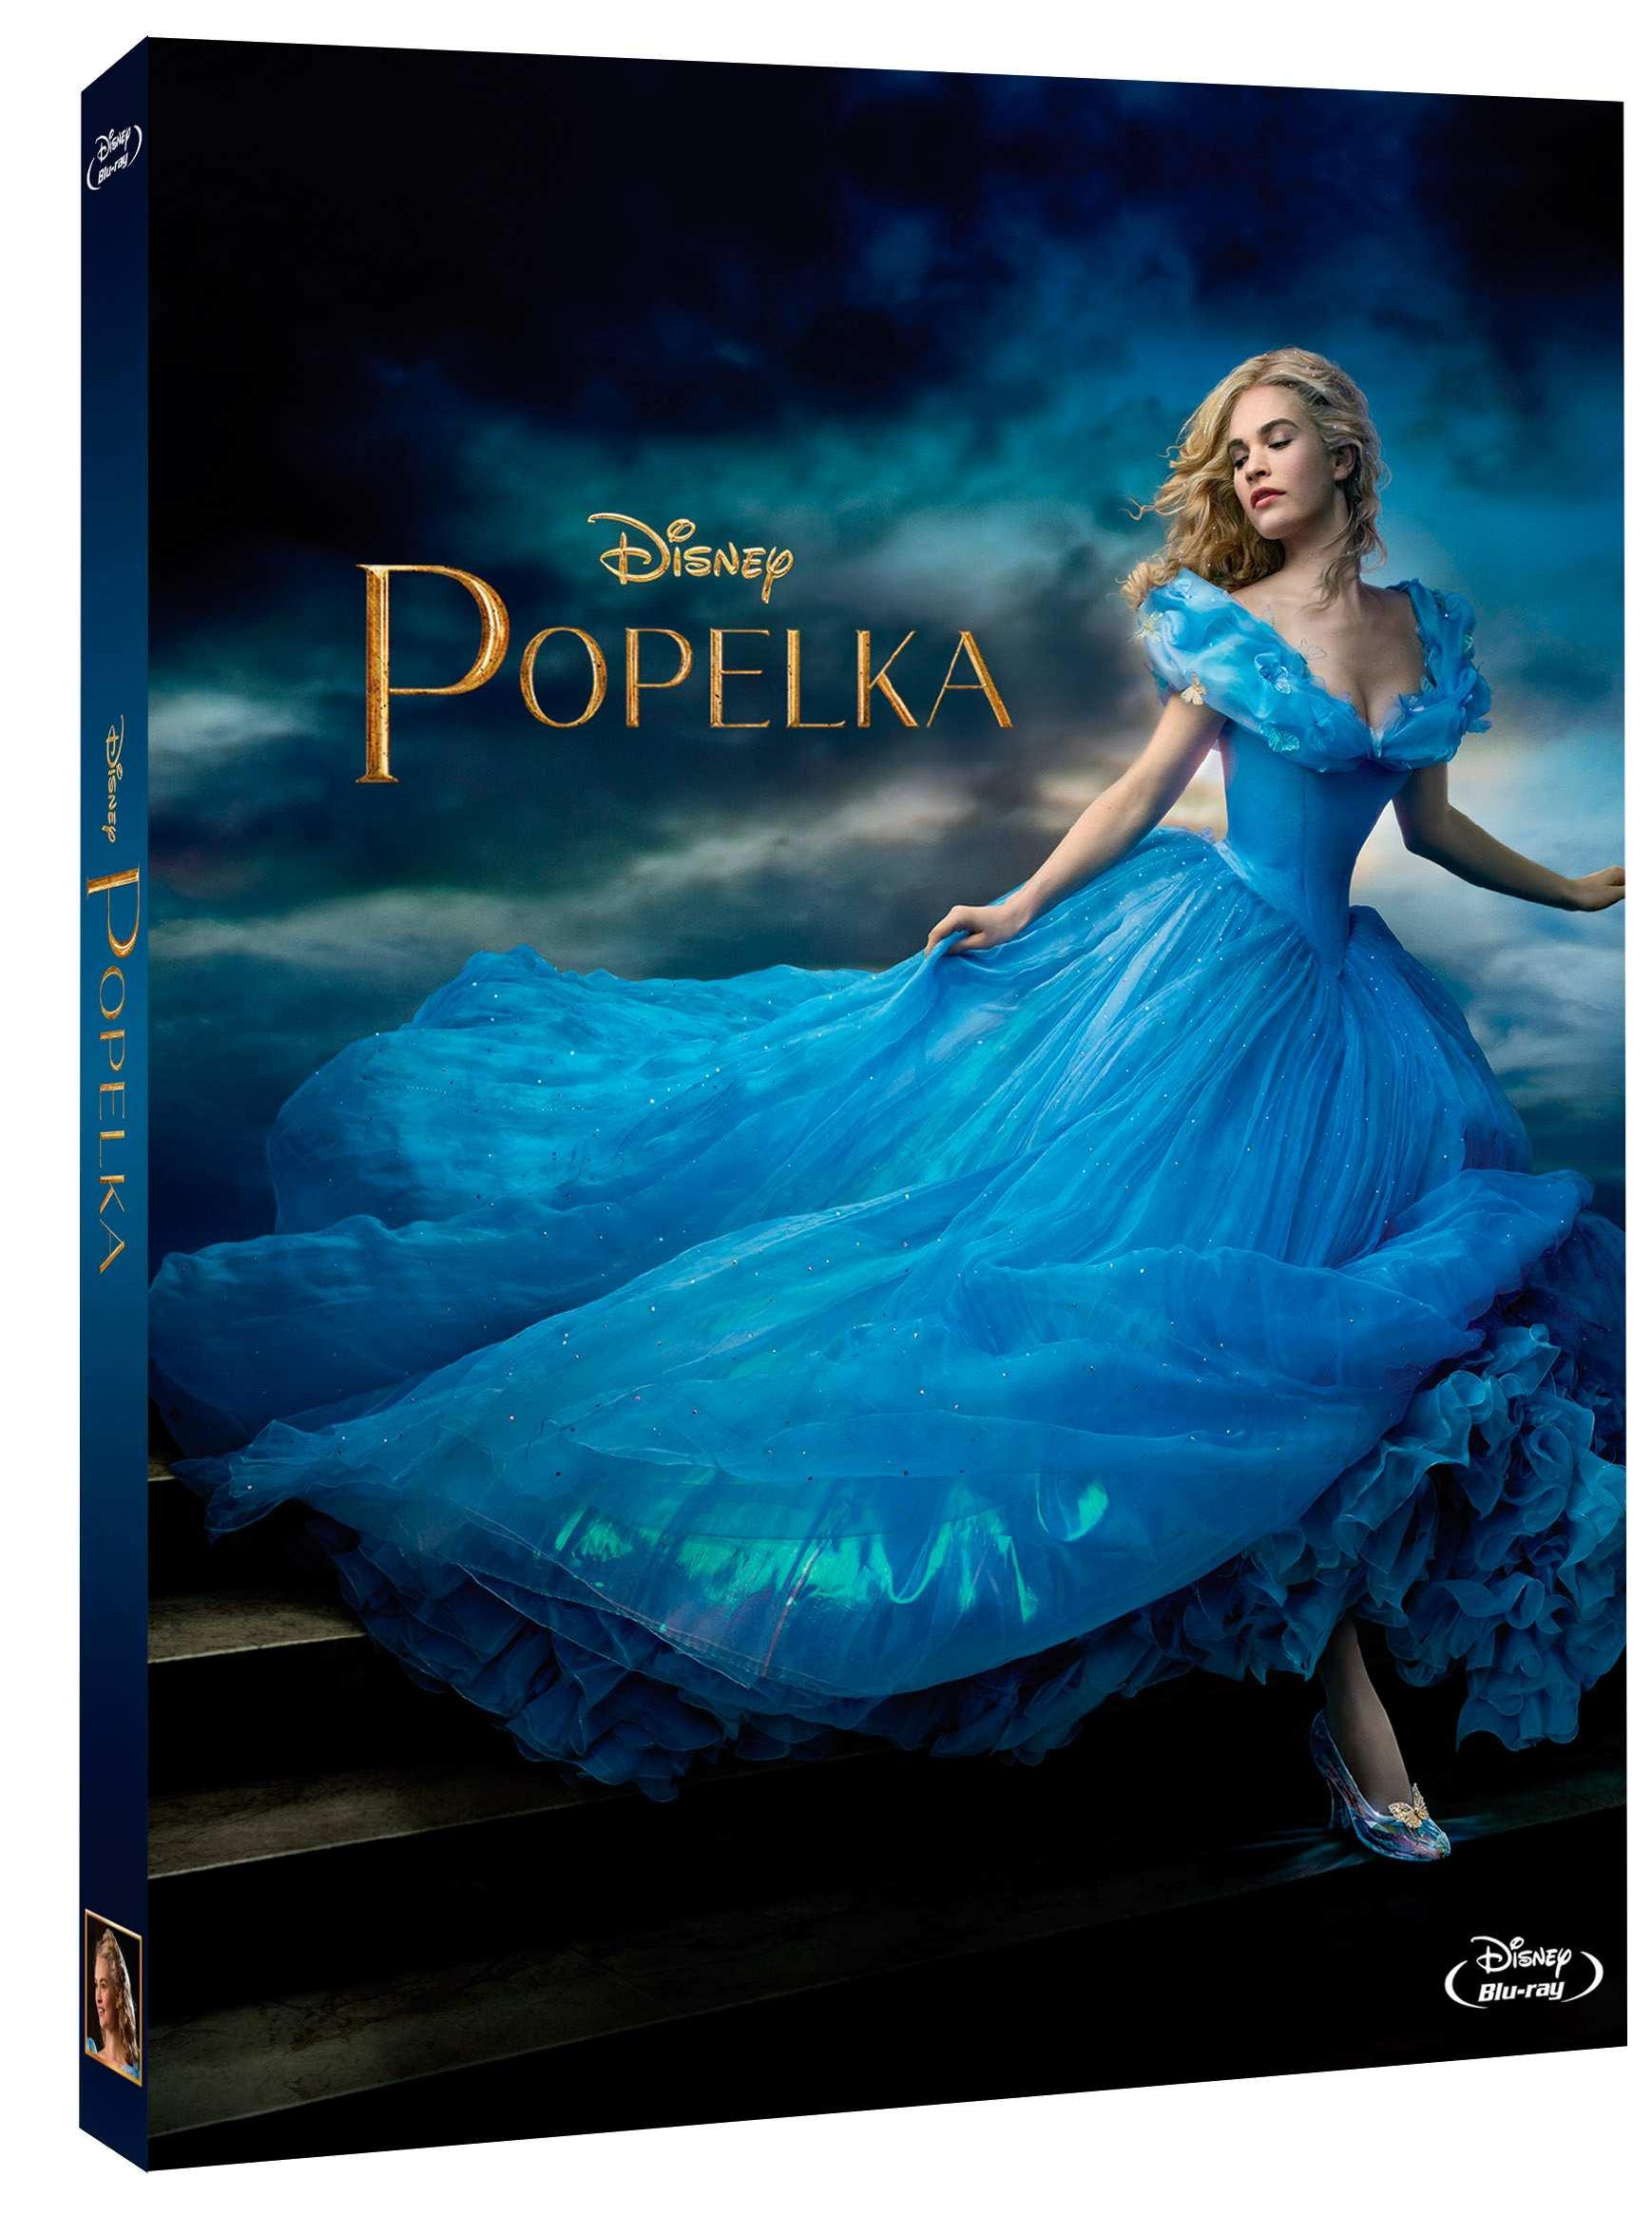 POPELKA (2015) - Blu-ray